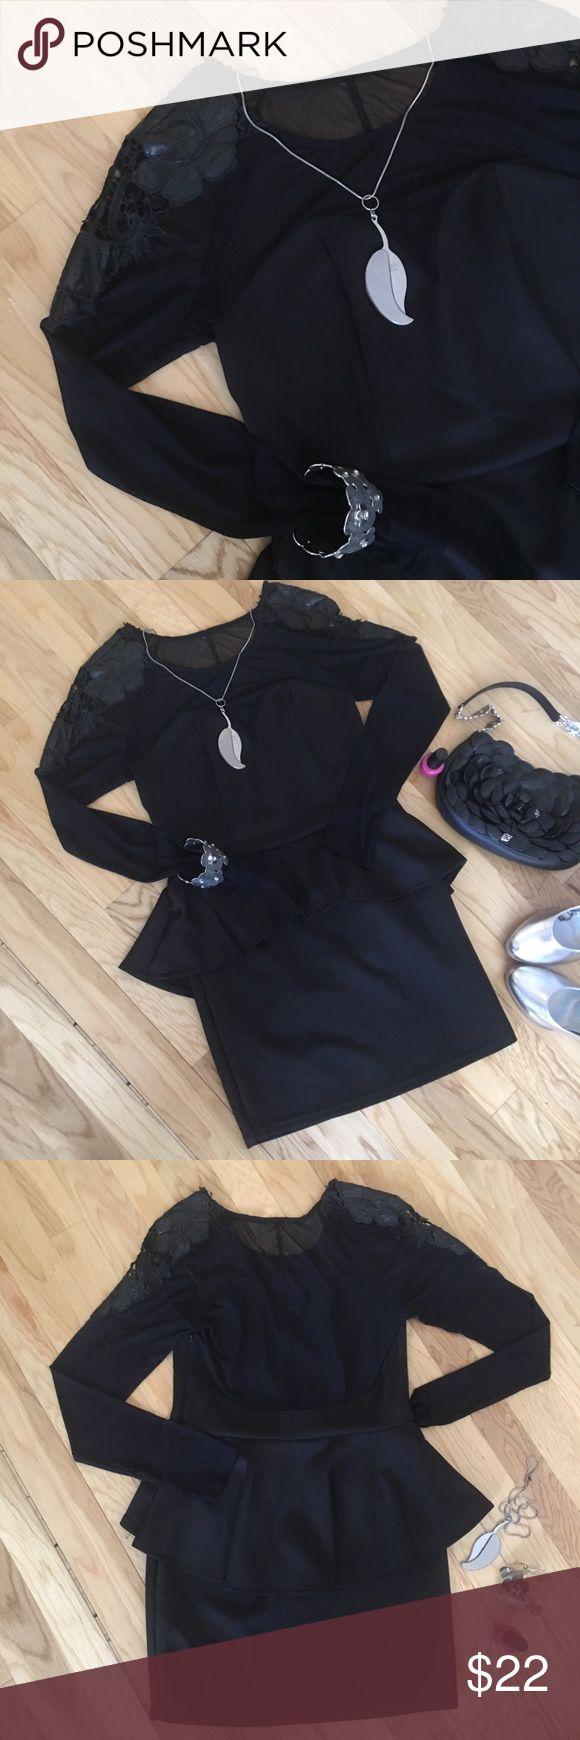 Black Beauty  Fashion Classy, Fashion, Clothes Design-7019